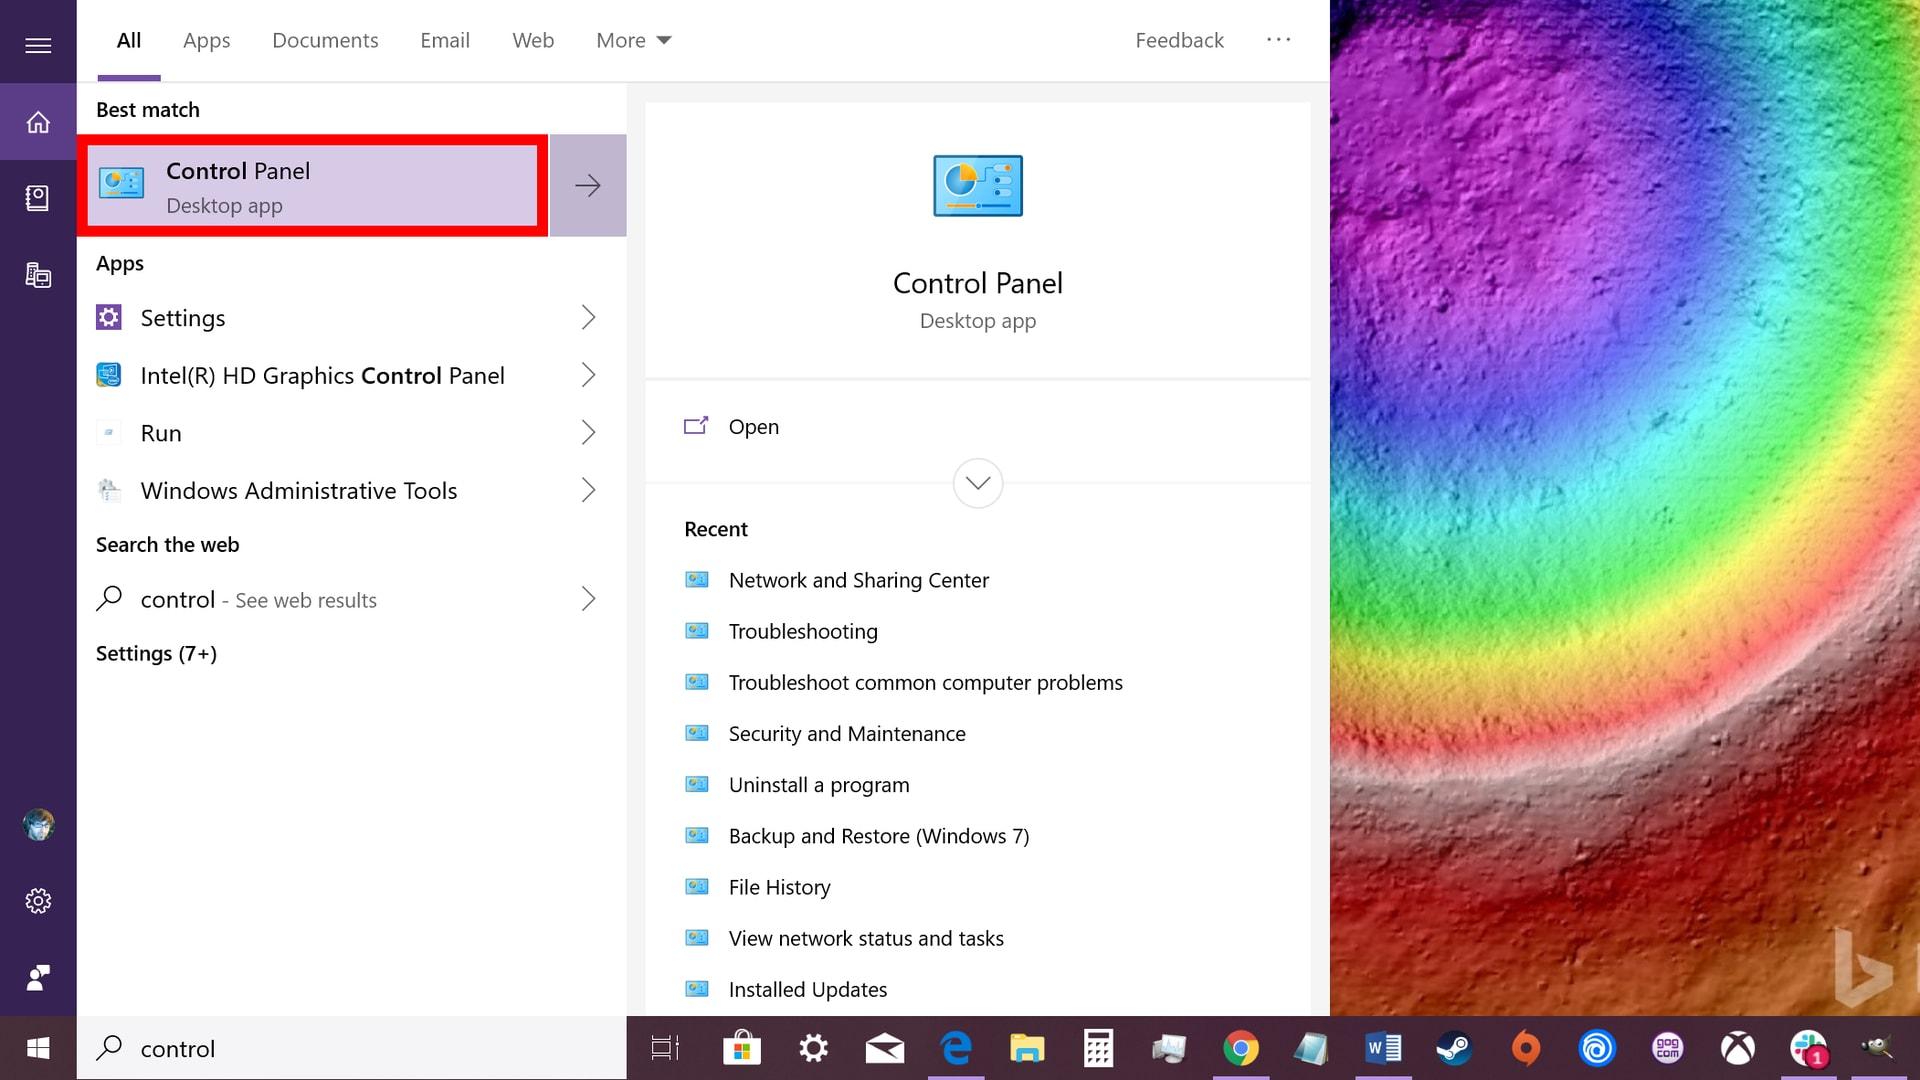 Windows 10 launch control panel